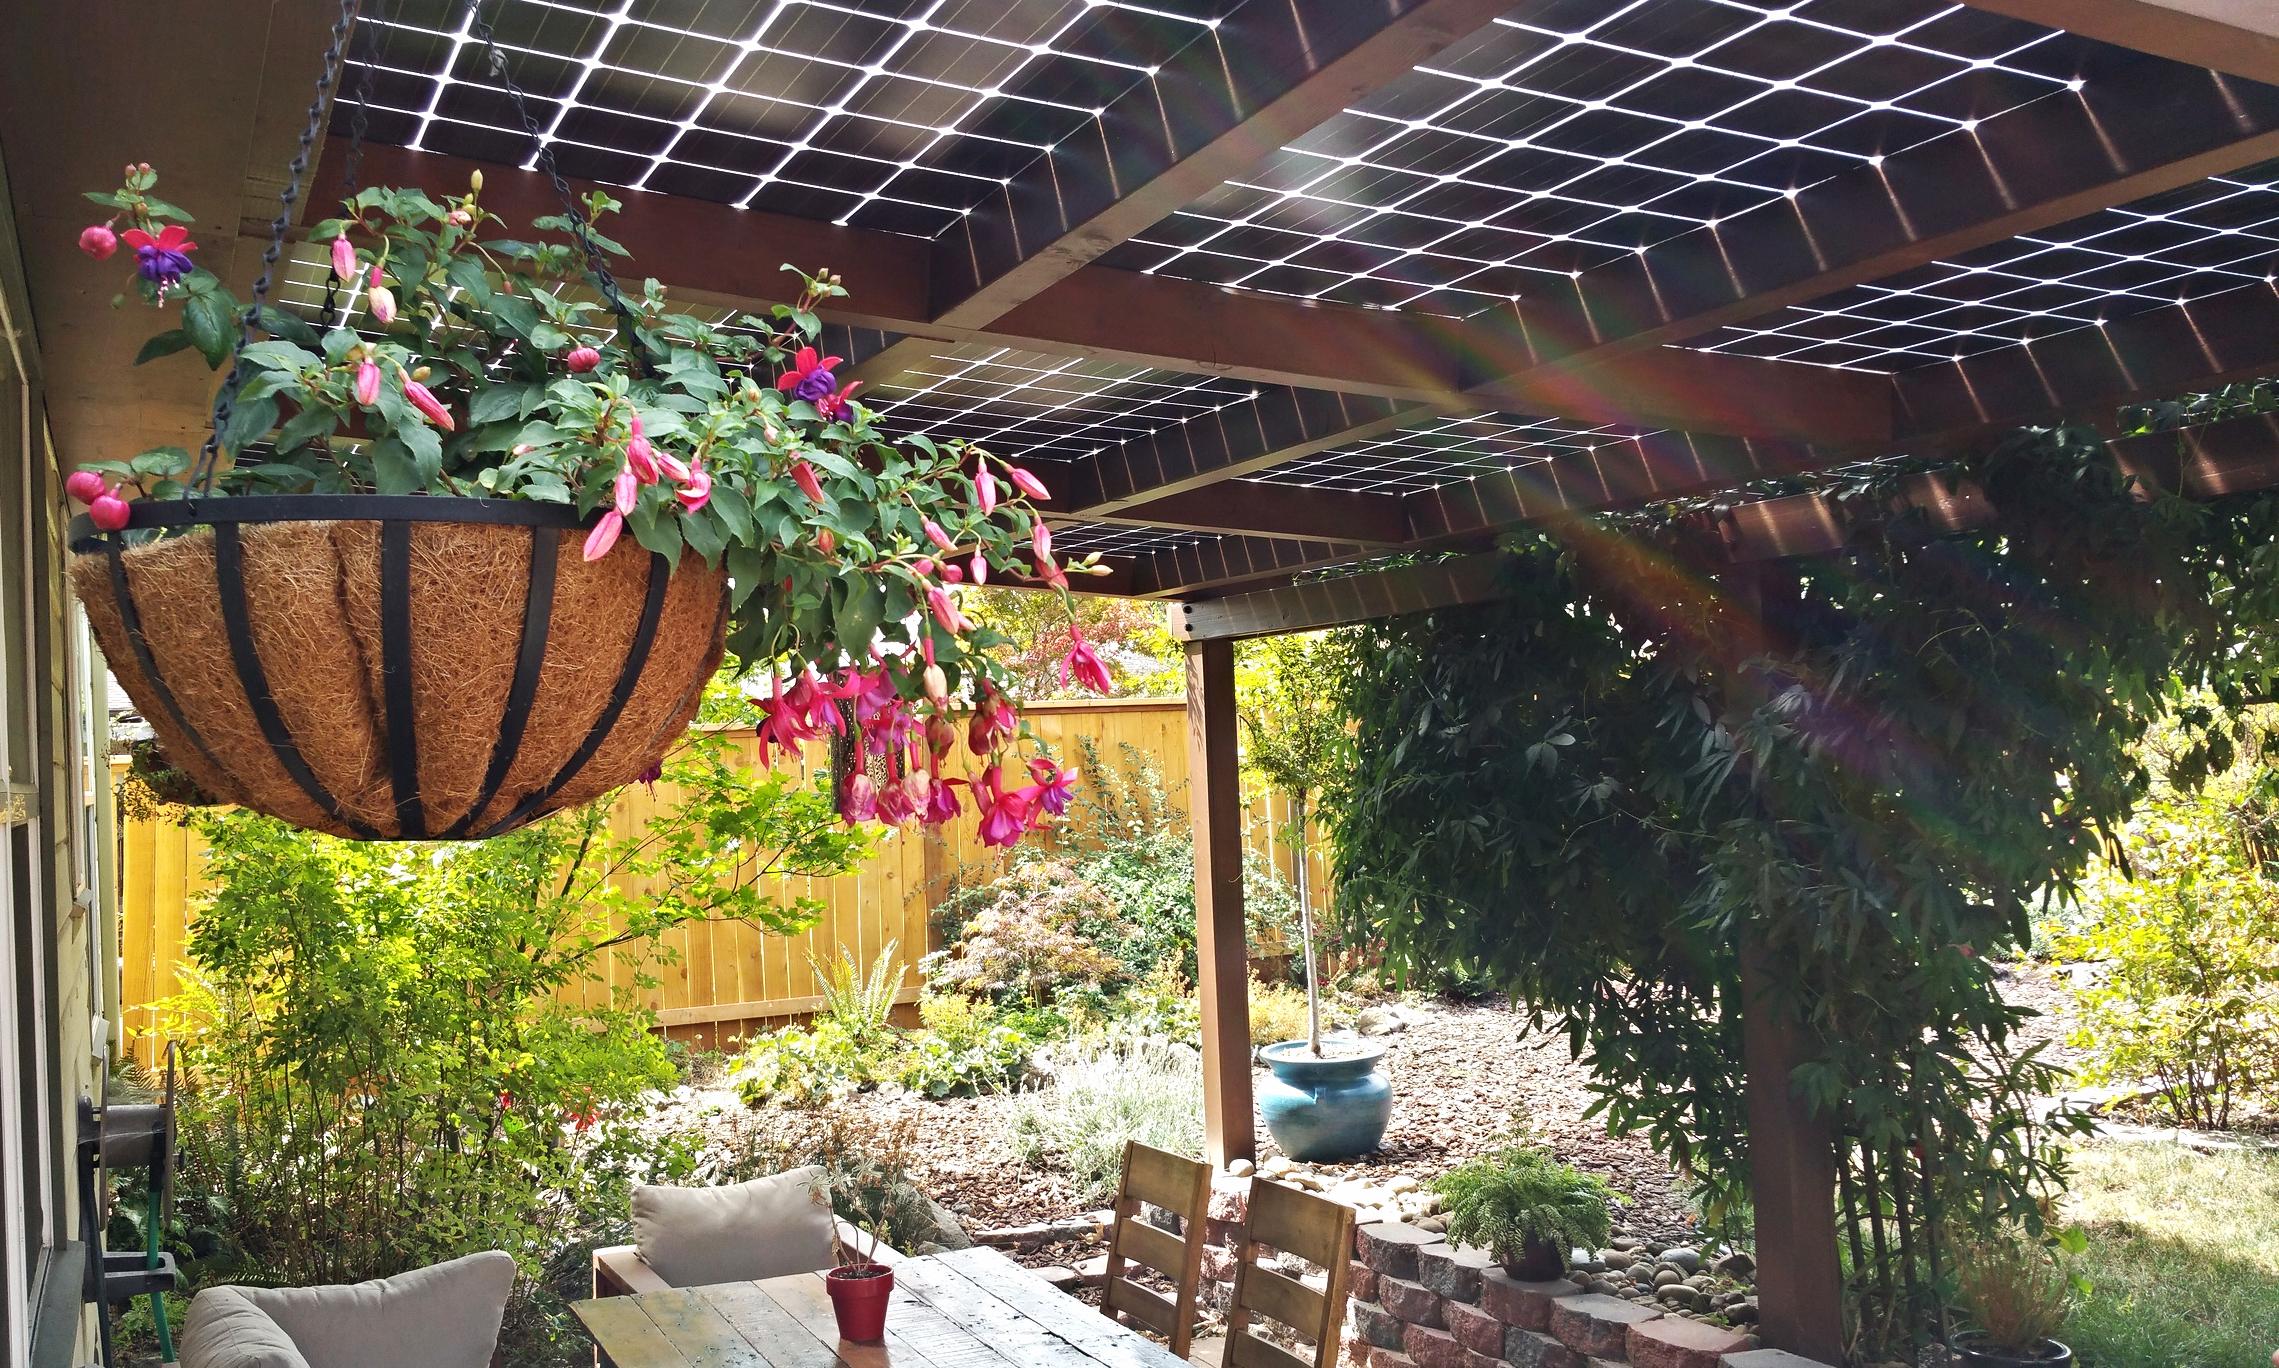 3.6kW bi-facial solar patio cover - Portland, Oregon